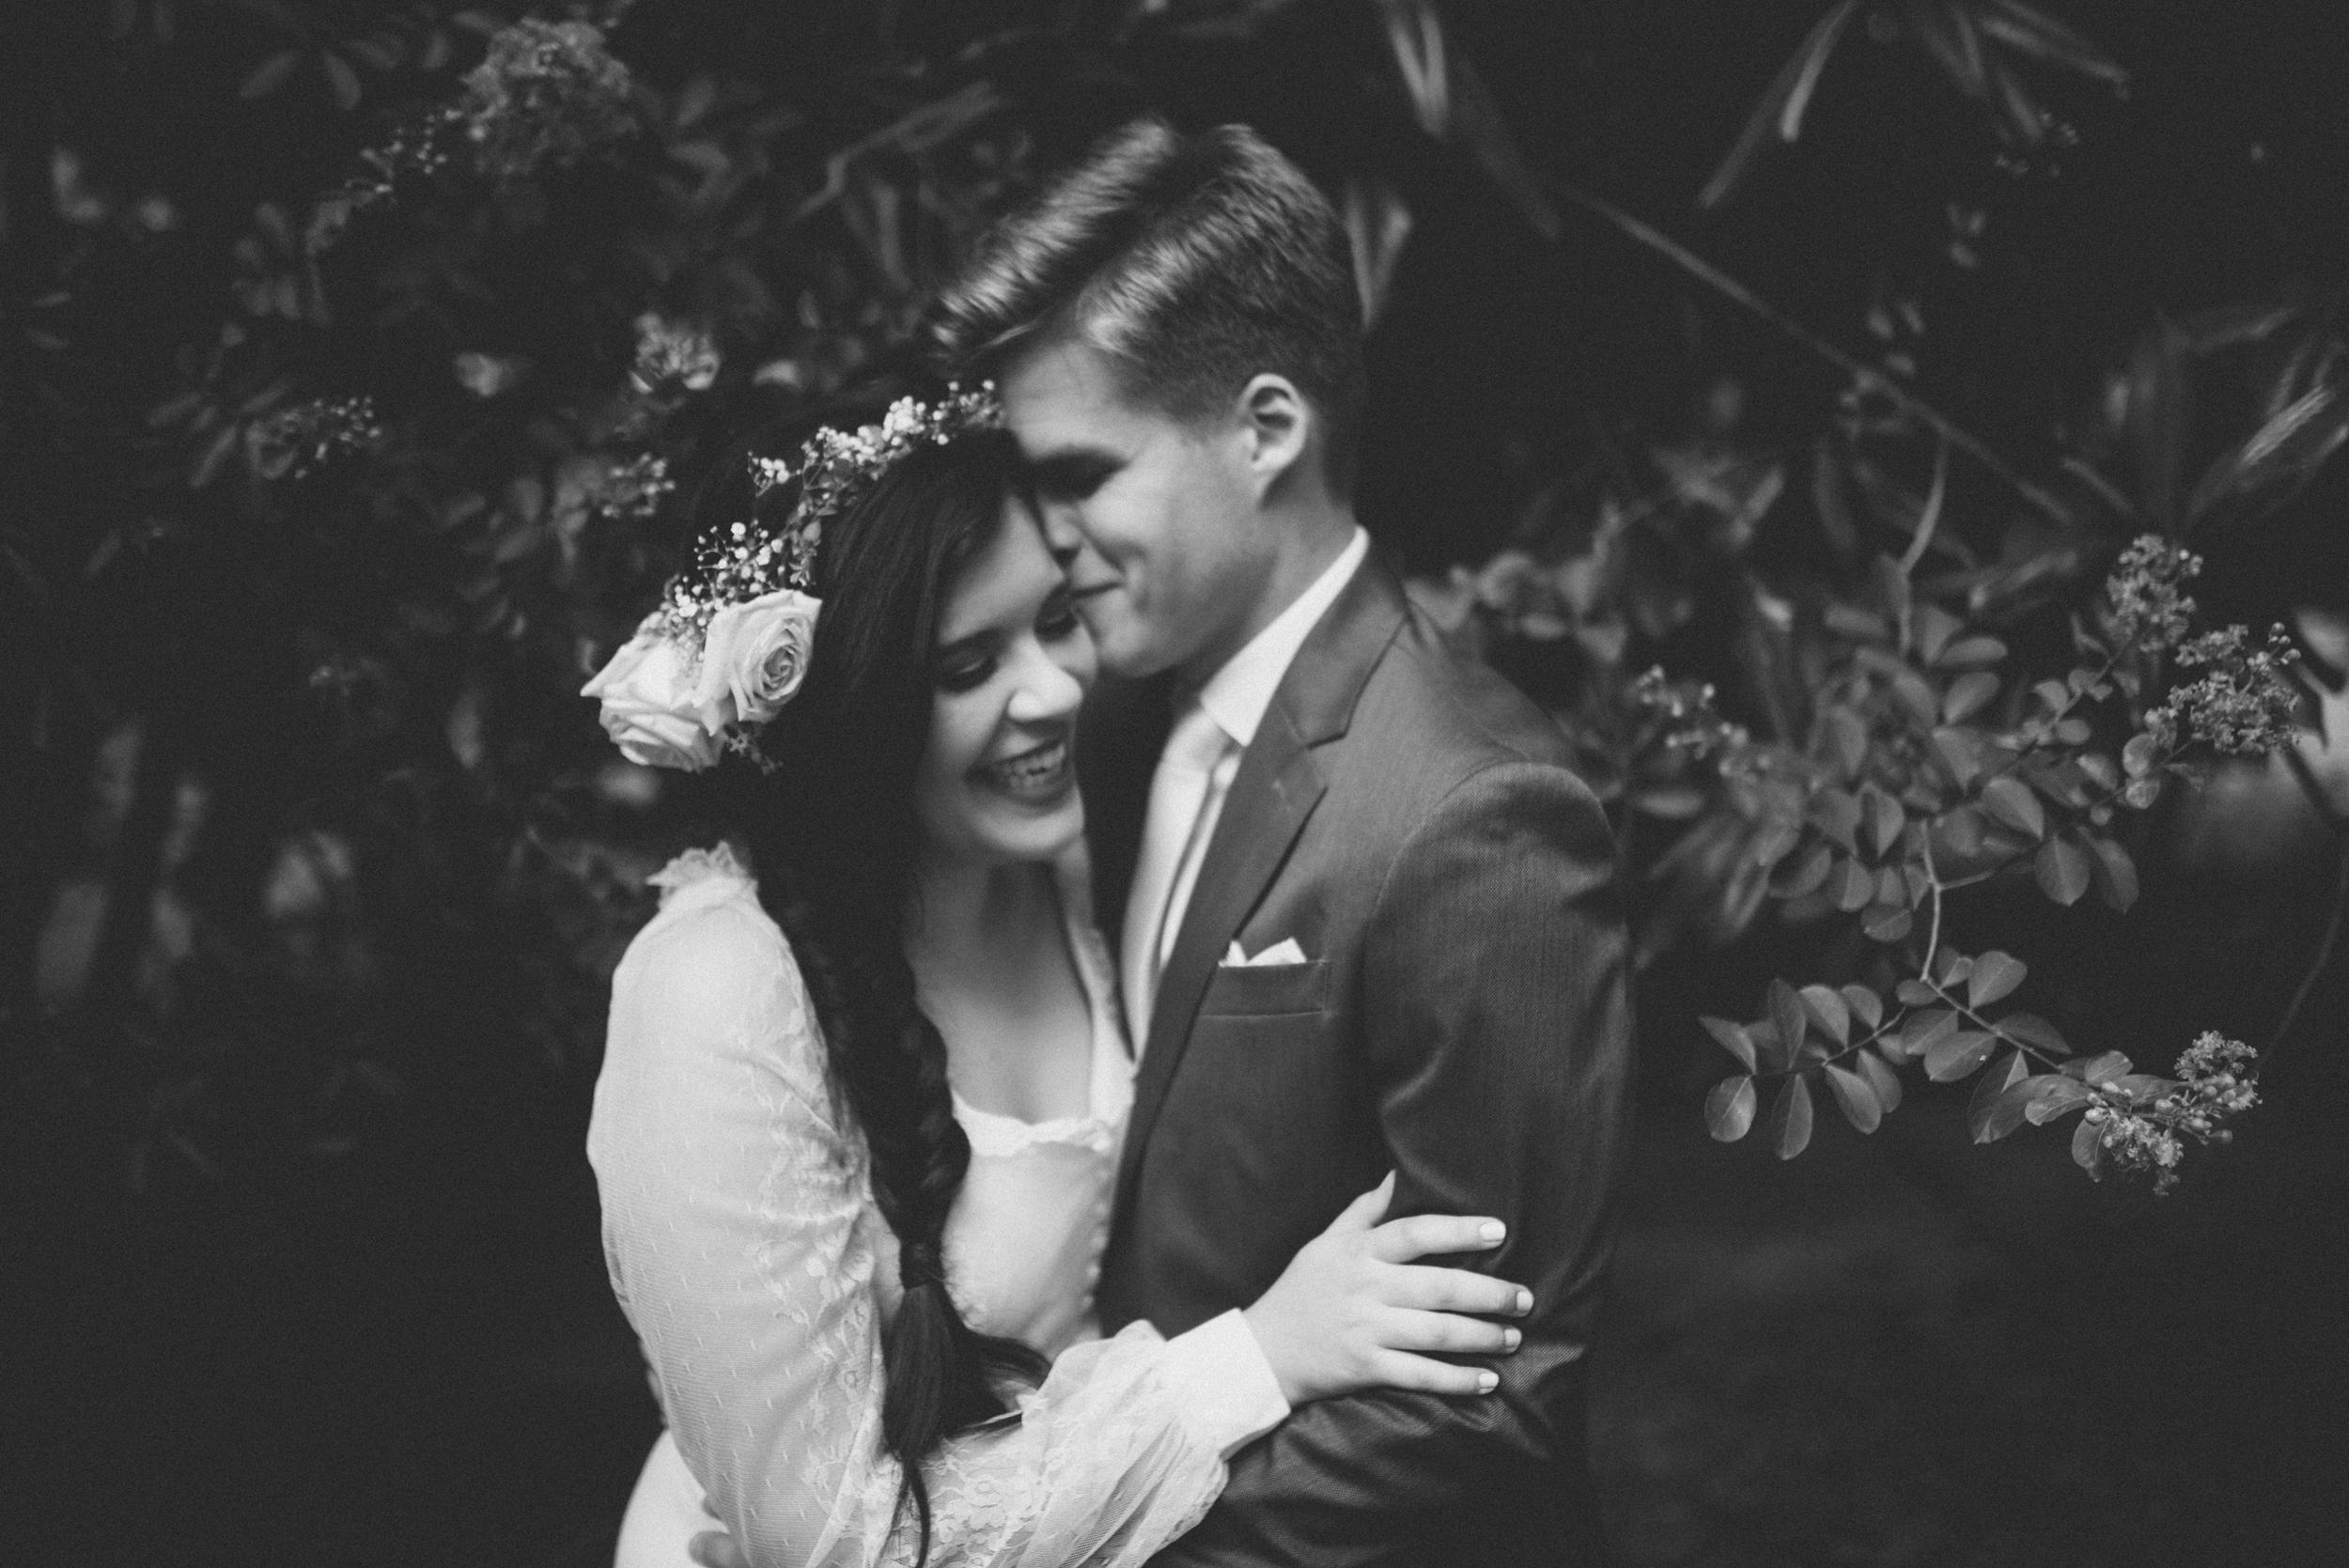 ofRen_weddingphotographer-83.jpg